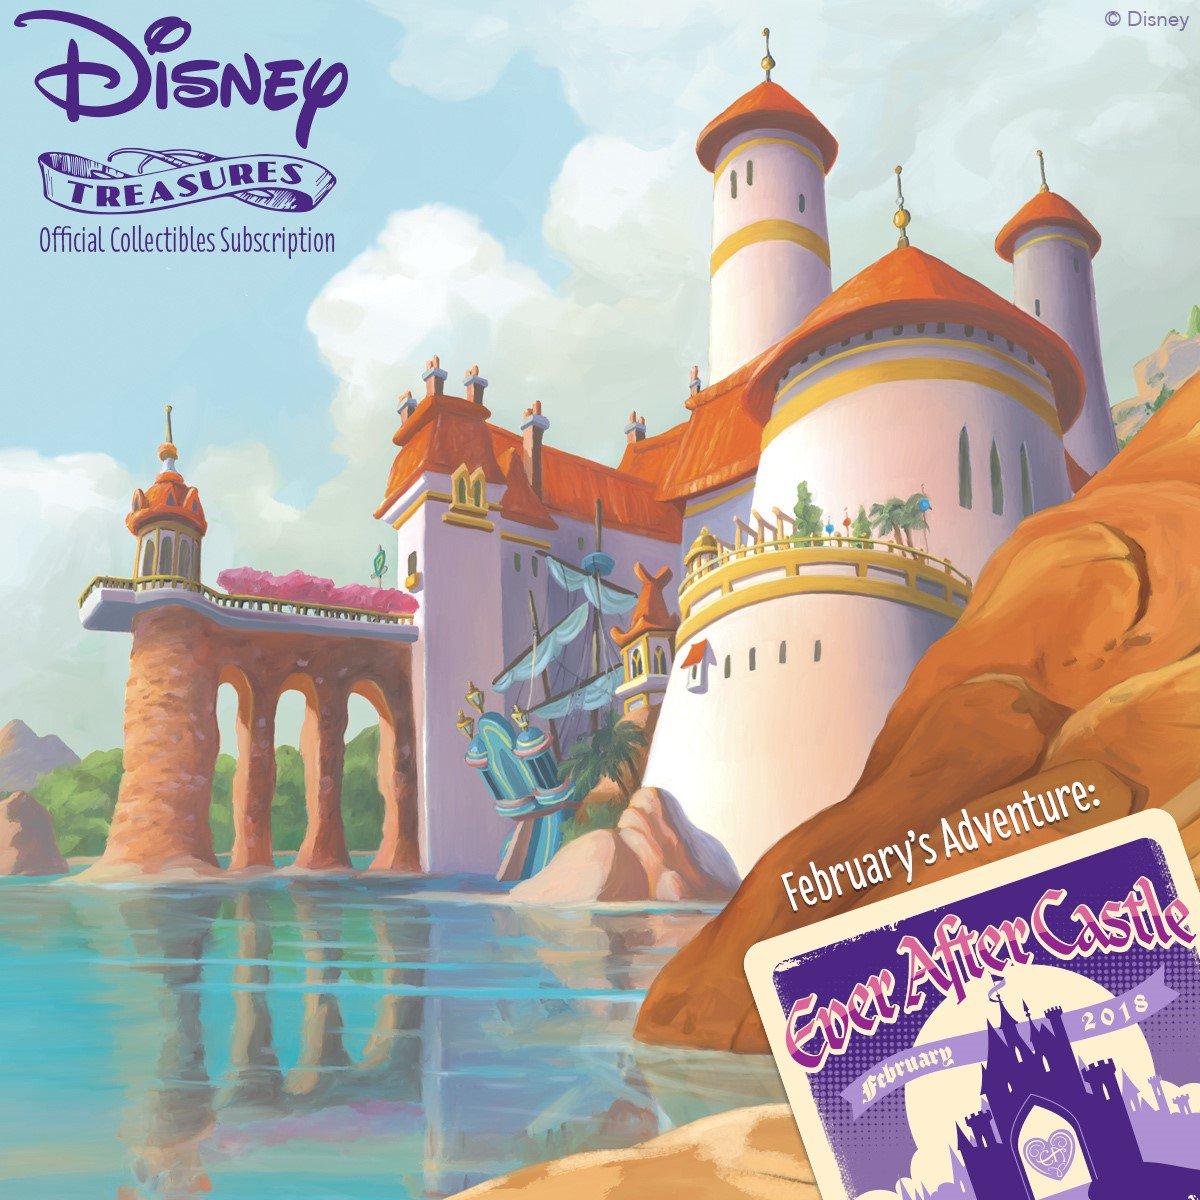 RT & follow @OriginalFunko for a chance to win a #DisneyTreasures Ever After Castle box! https://t.co/OYajnaJpY7 https://t.co/ZE6hcDA1UC